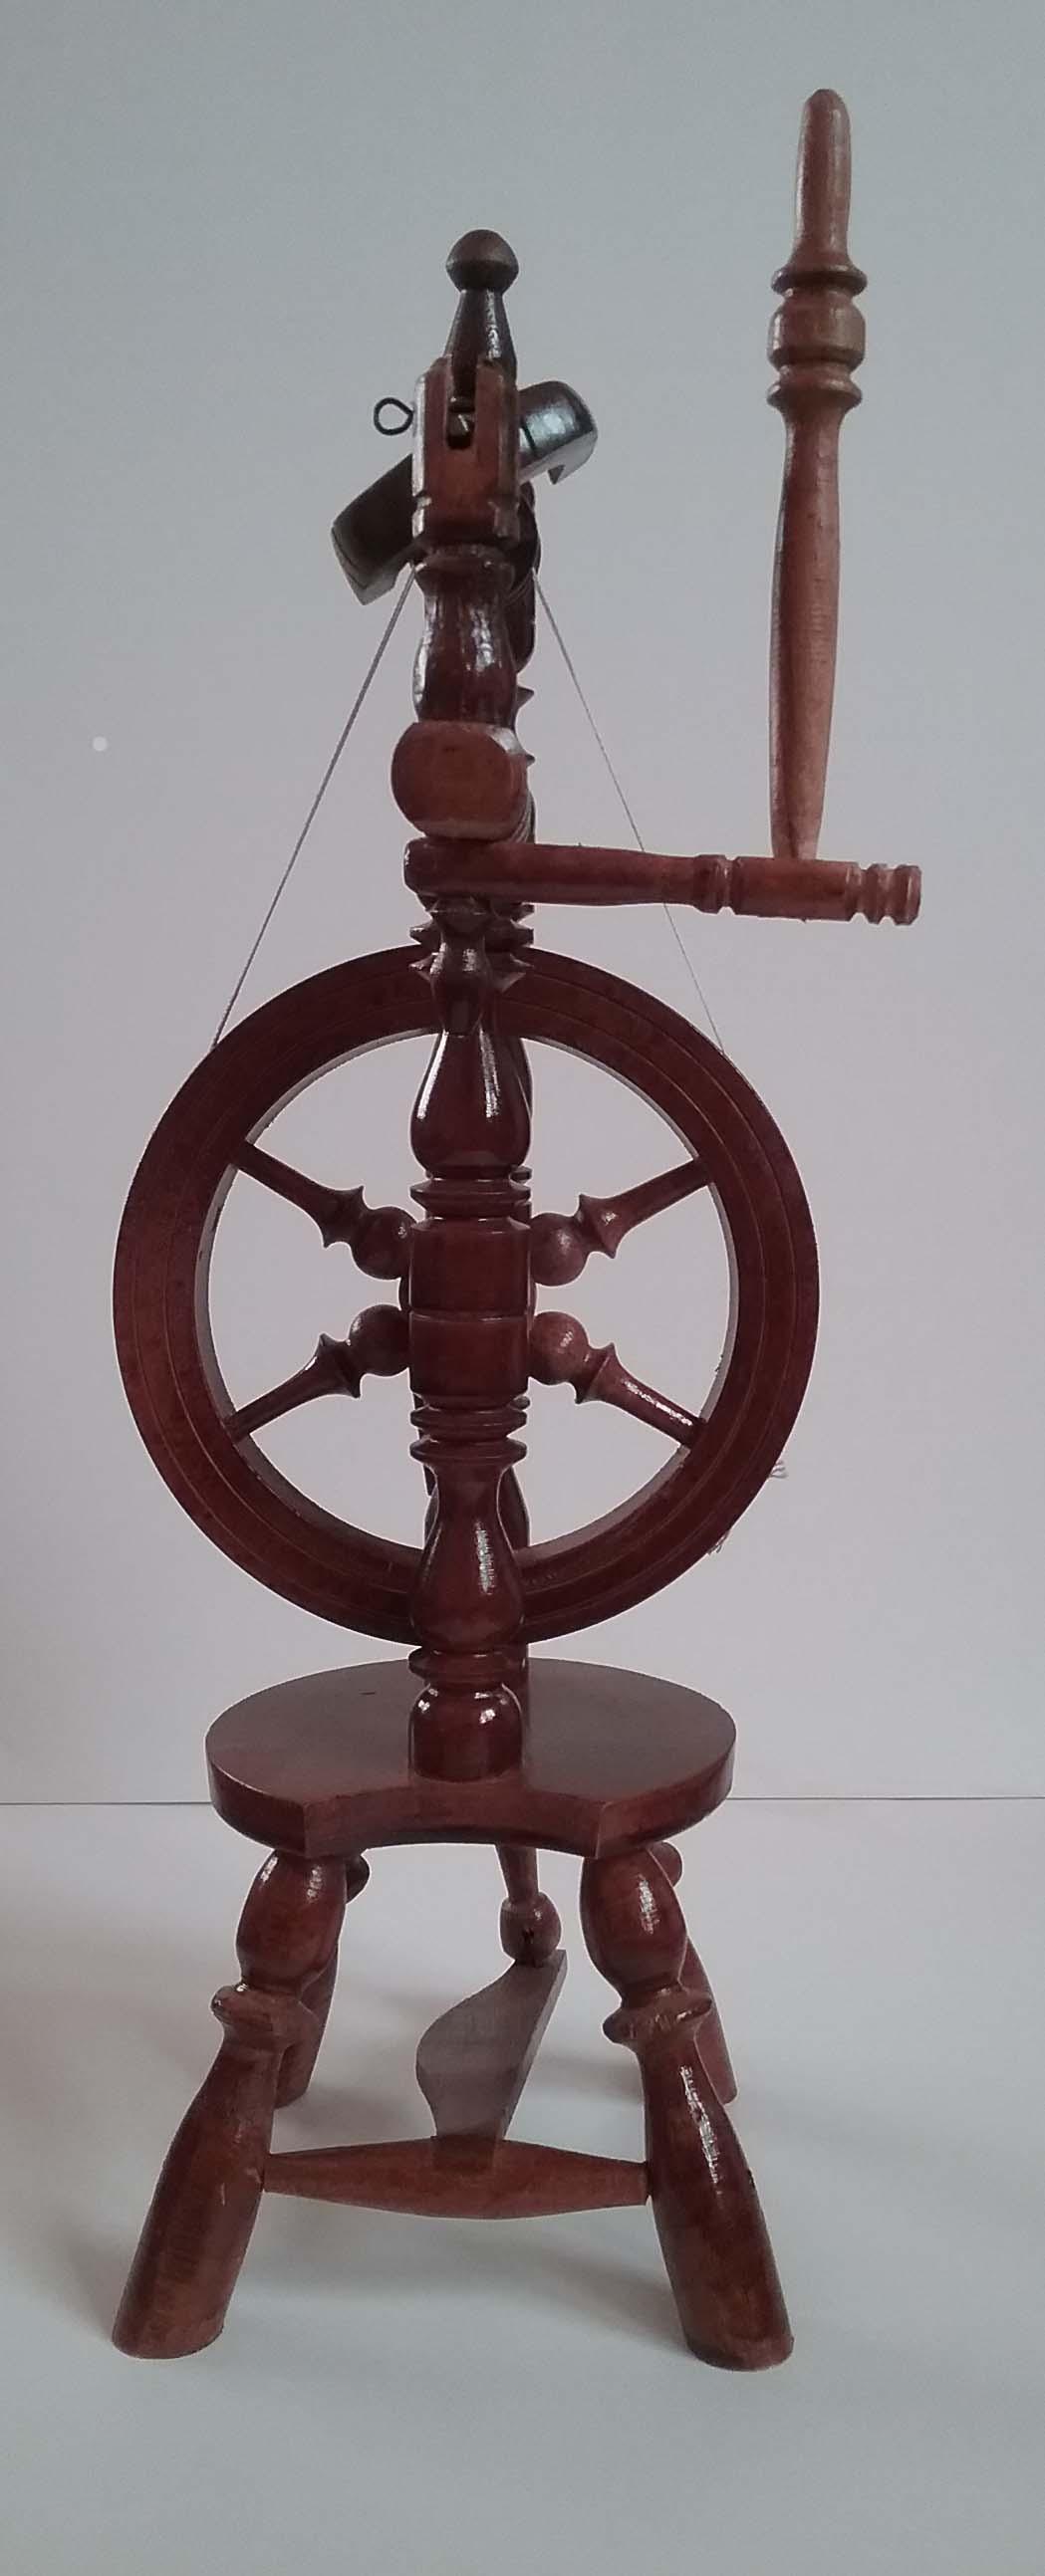 BOUNTIFUL - Spinning and Weaving: Bountiful Treasures